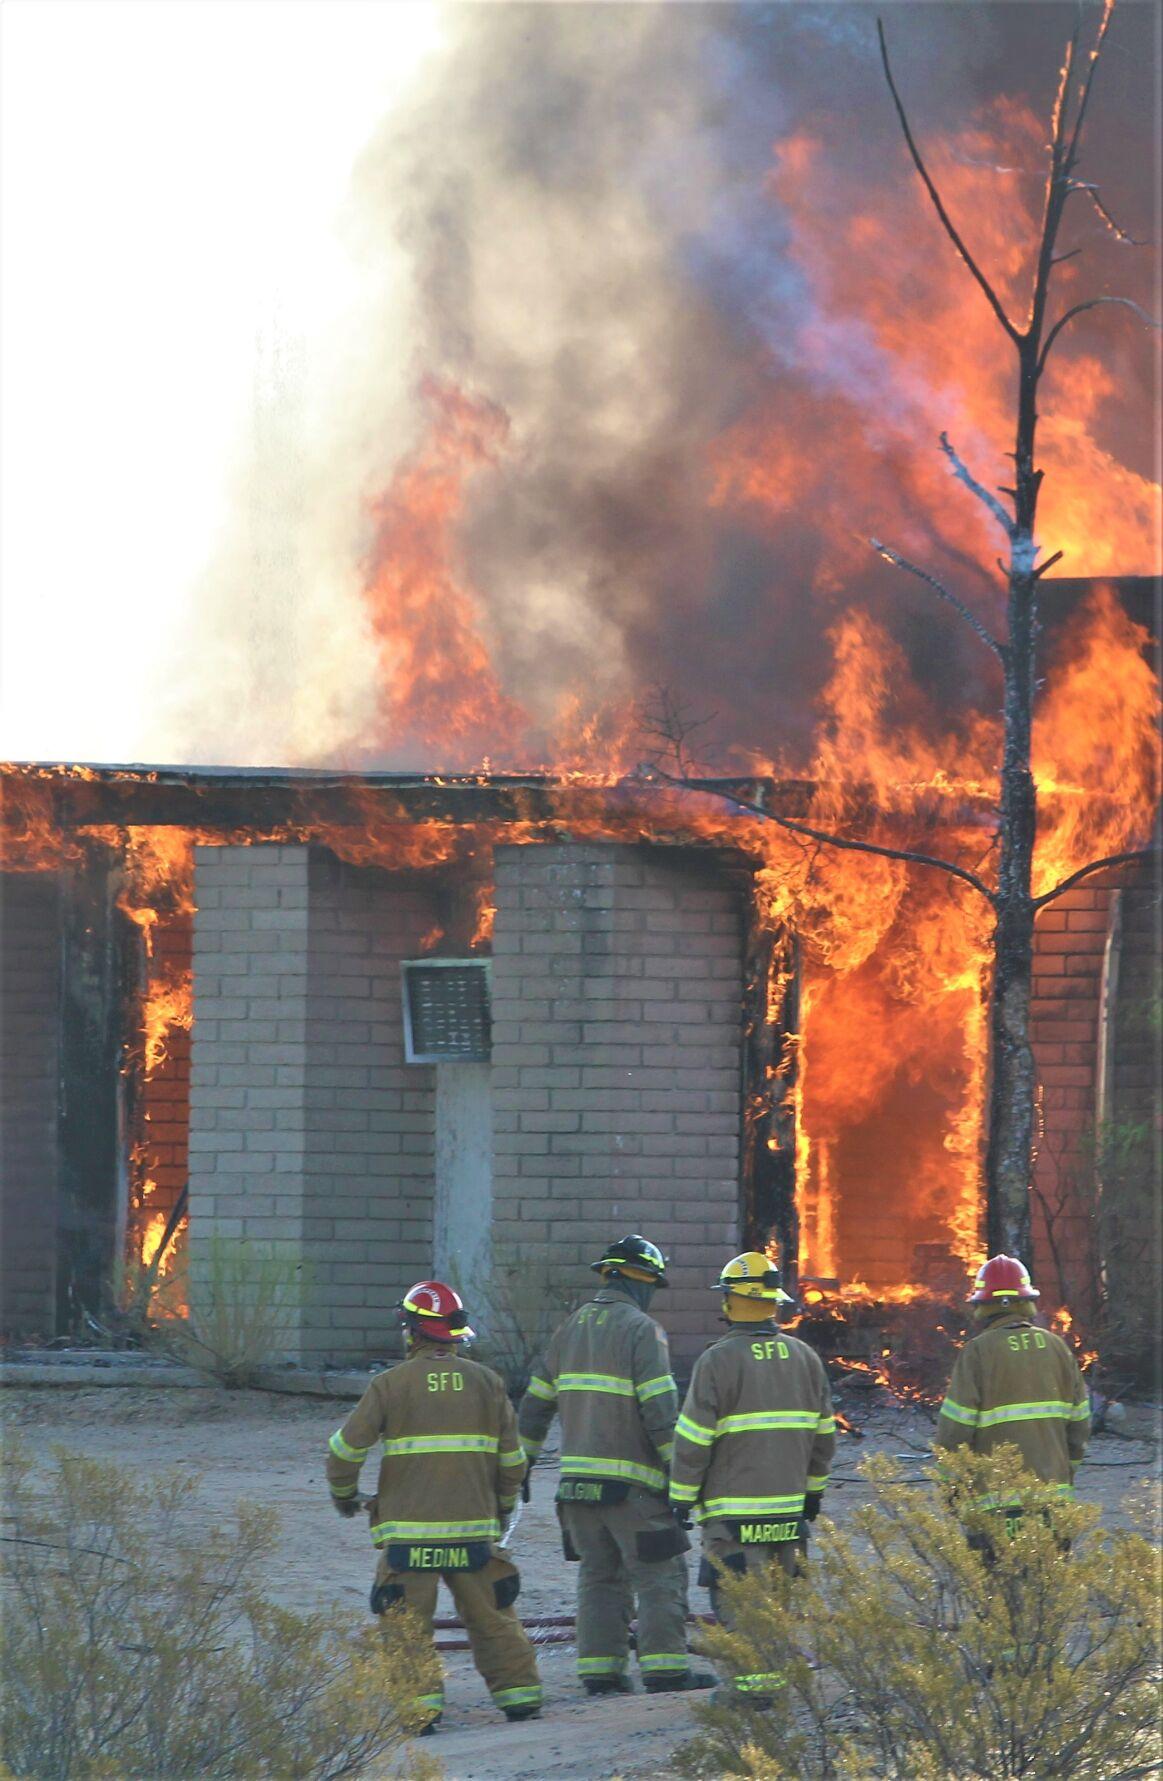 201021-localnews-saffordfire (1).JPG